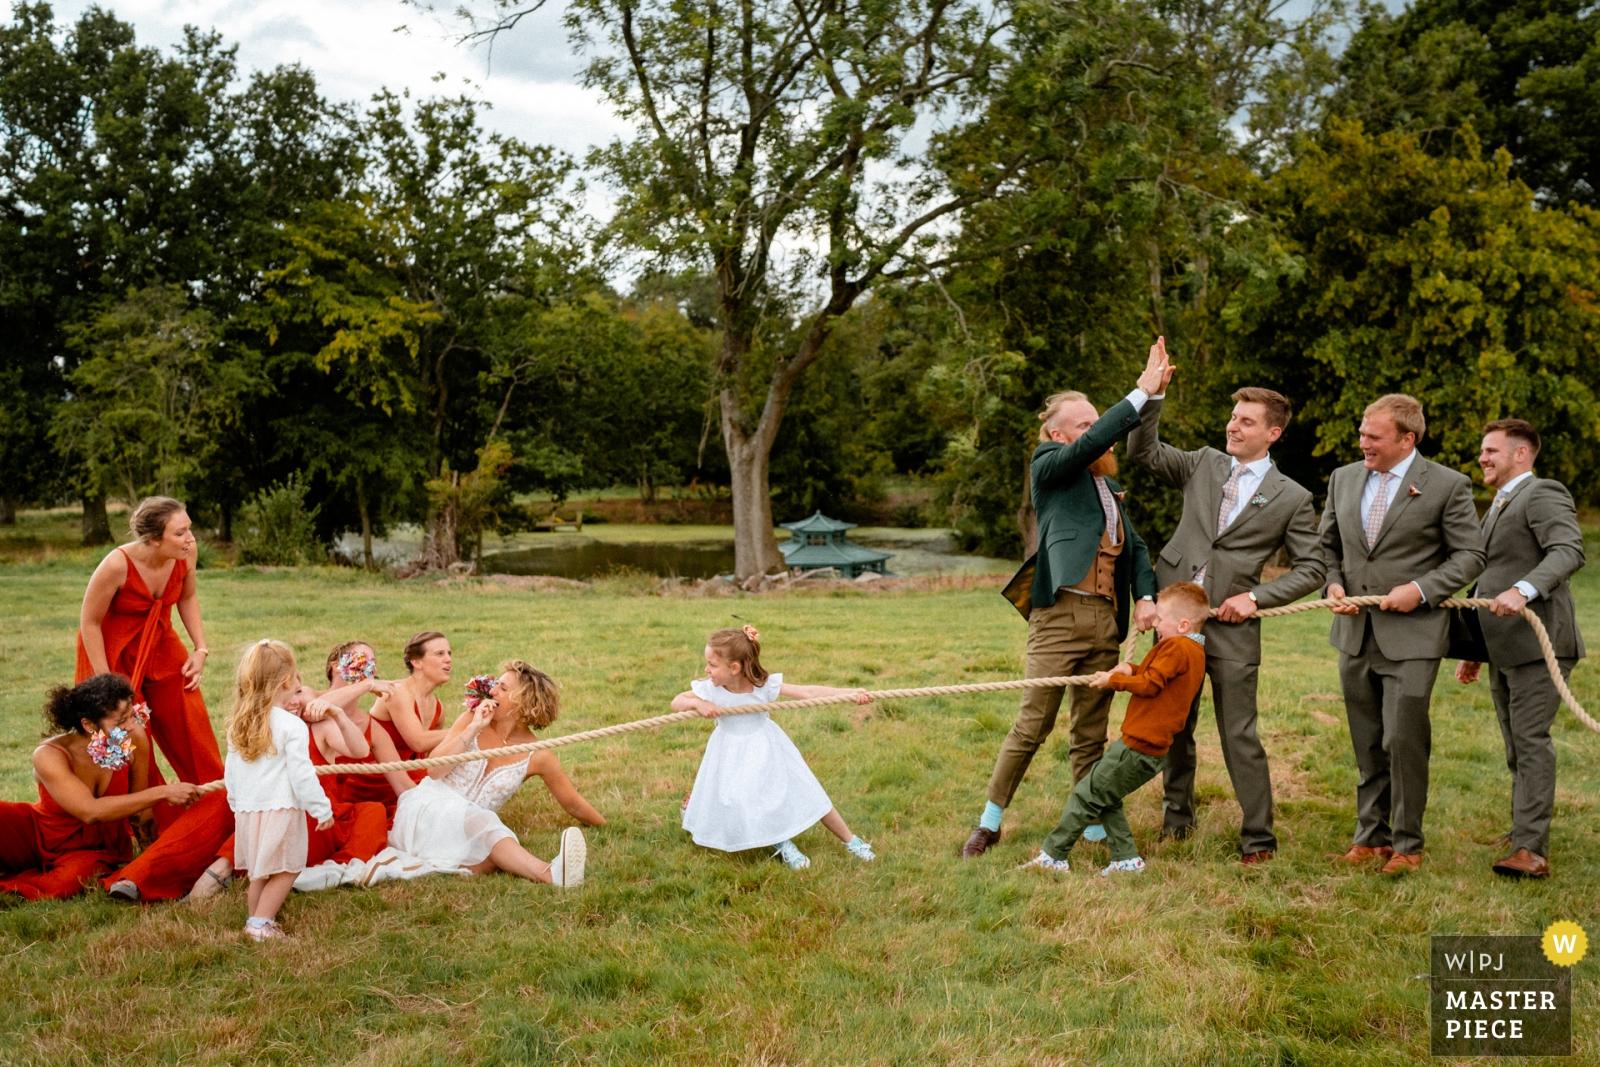 Bride and bridesmaids loose tug of war with groomsmen - Hertfordshire, England Wedding Photography -  | Swallows Oast, Ticehurst, UK